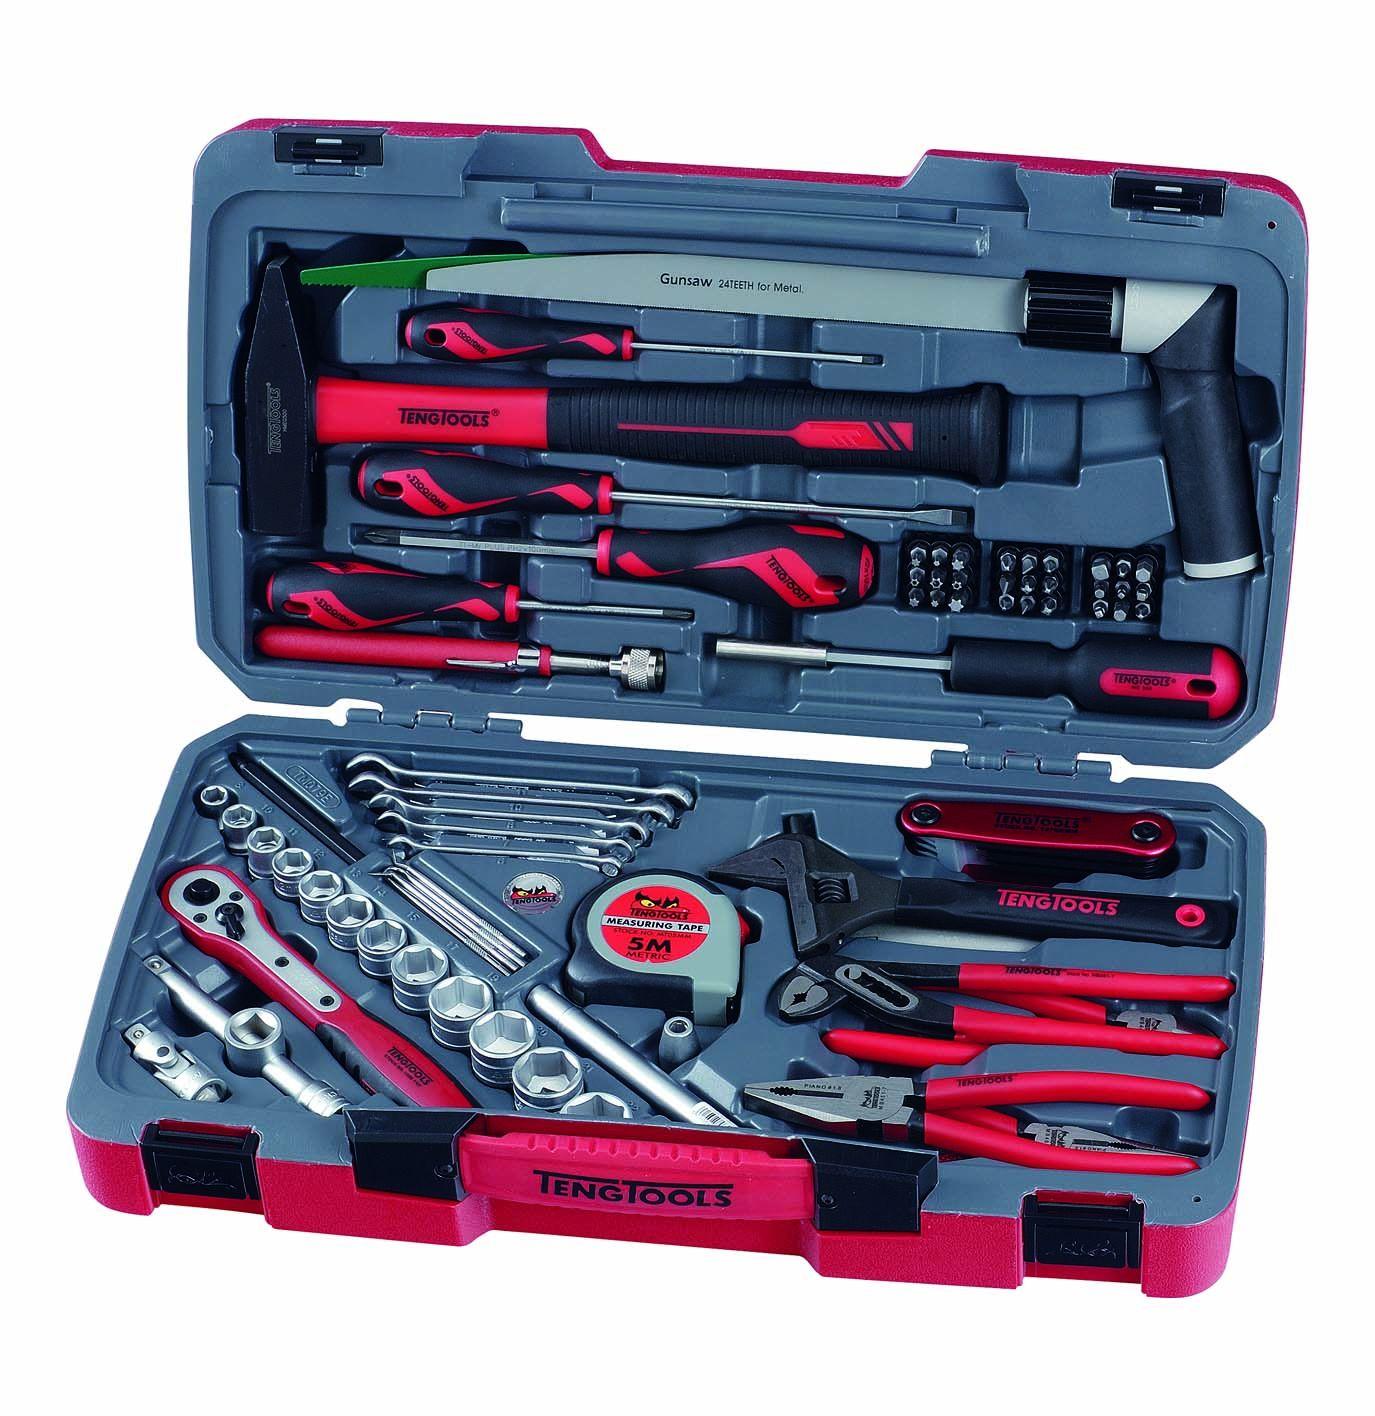 "Teng Tools 79 Piece 3/8"" Drive Engineers Tool Set"